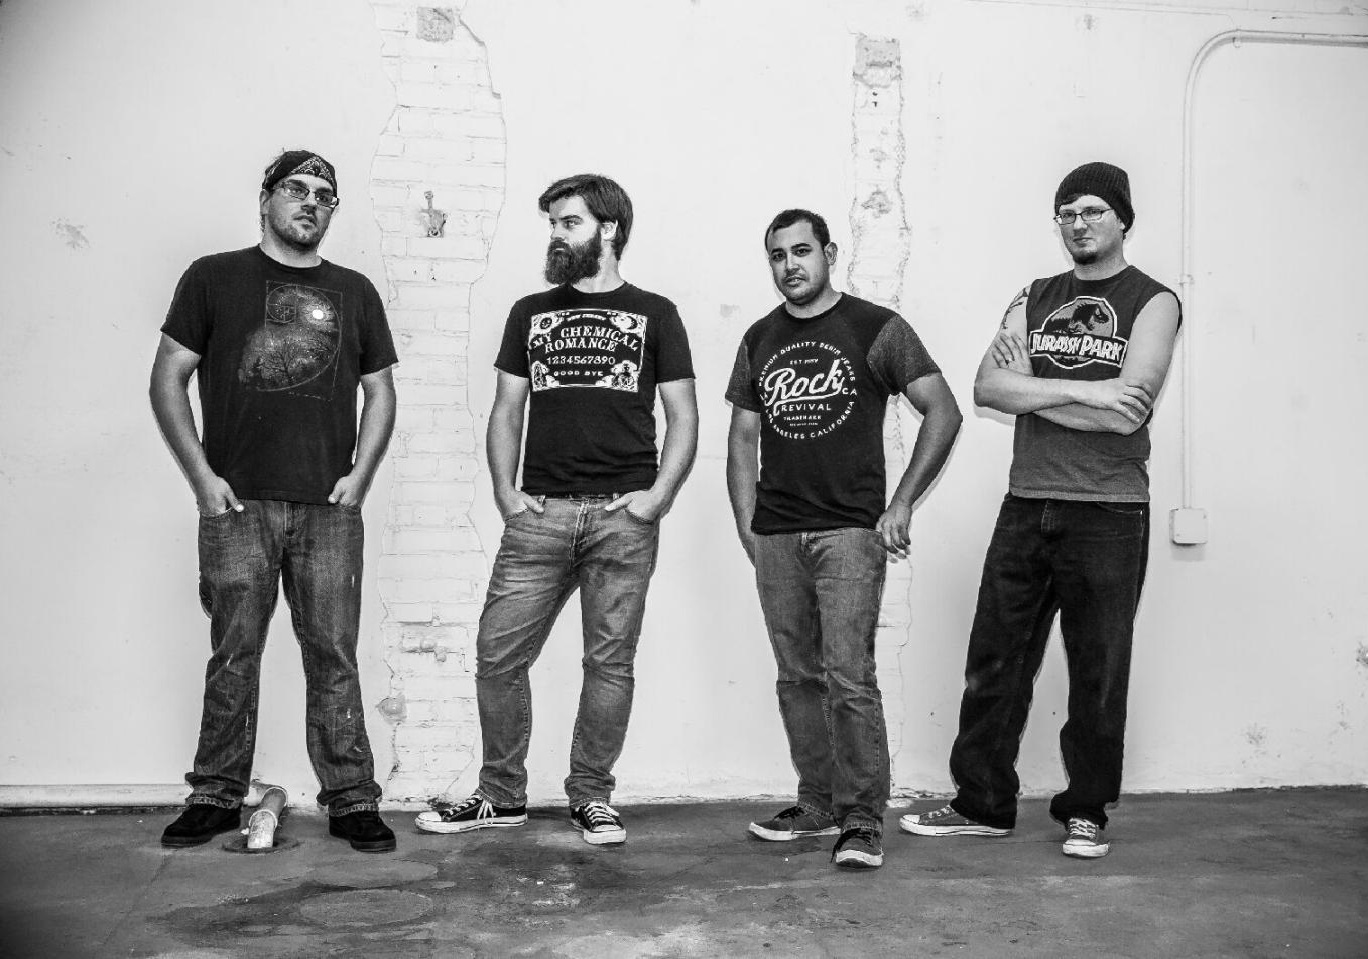 Black t shirt reverbnation - Black T Shirt Reverbnation 41